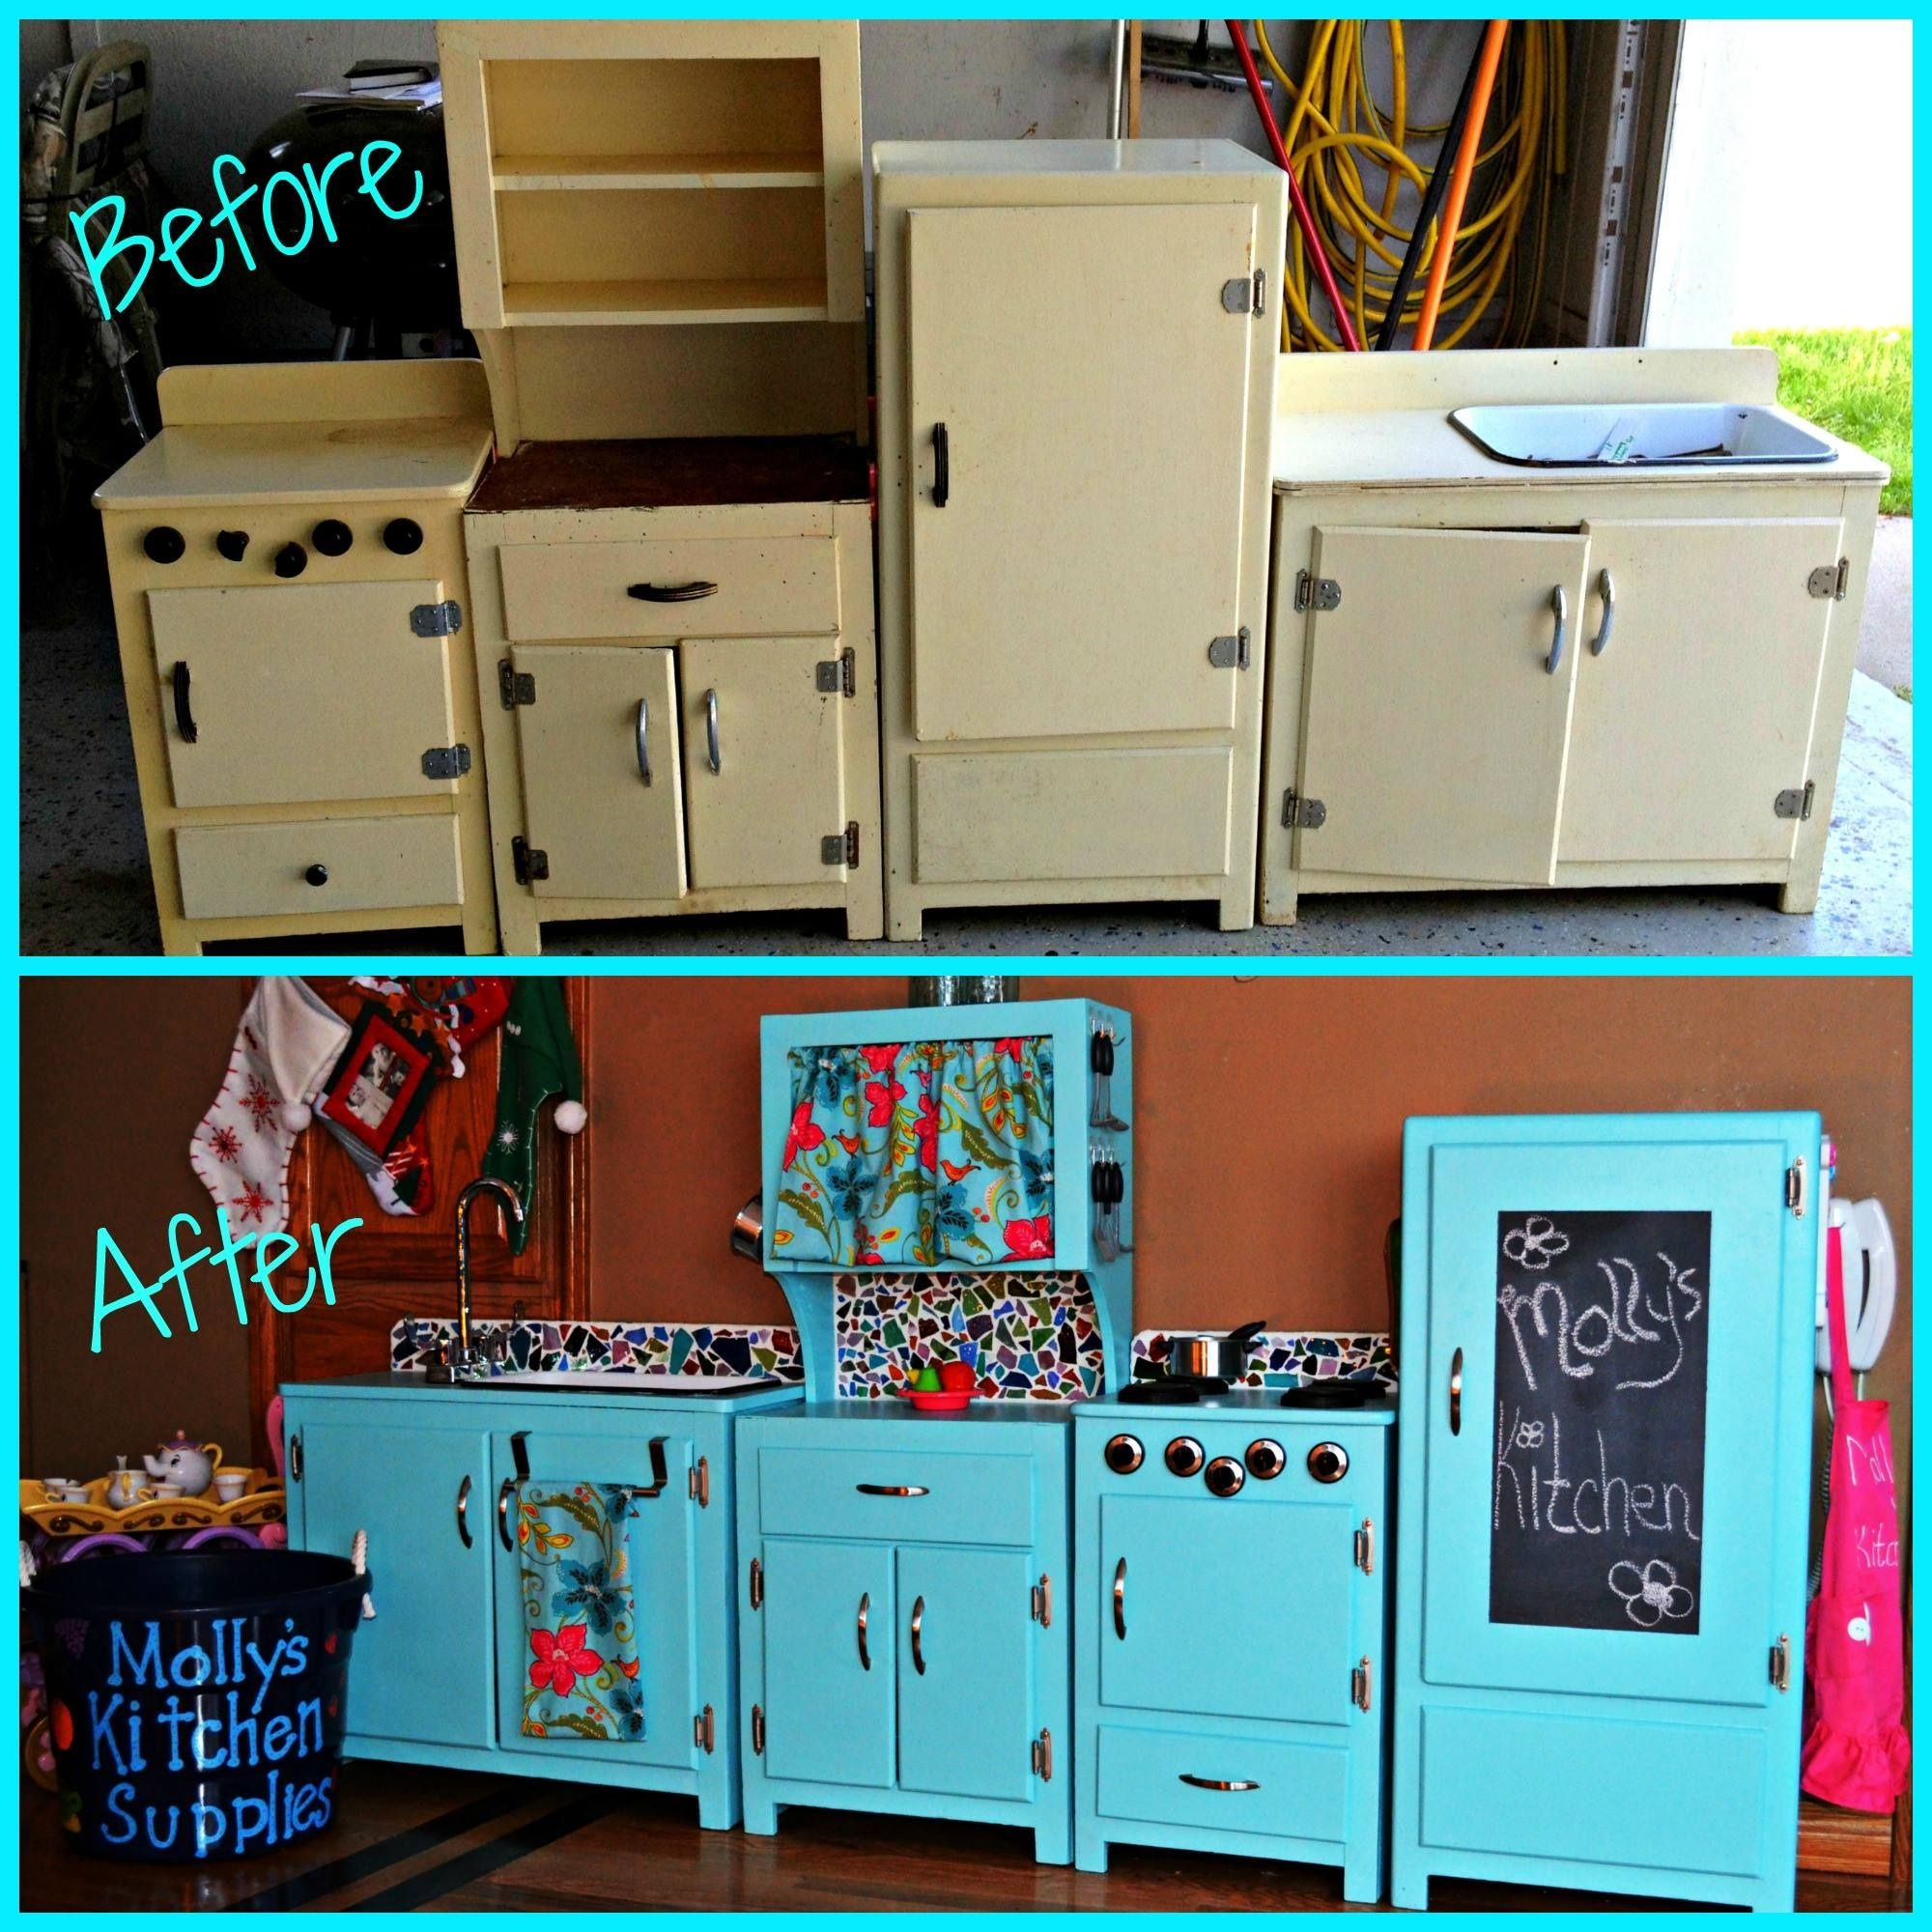 DIY, Restored, Vintage, Antique, Child, Mosaic, Chalkboard, Girl ...